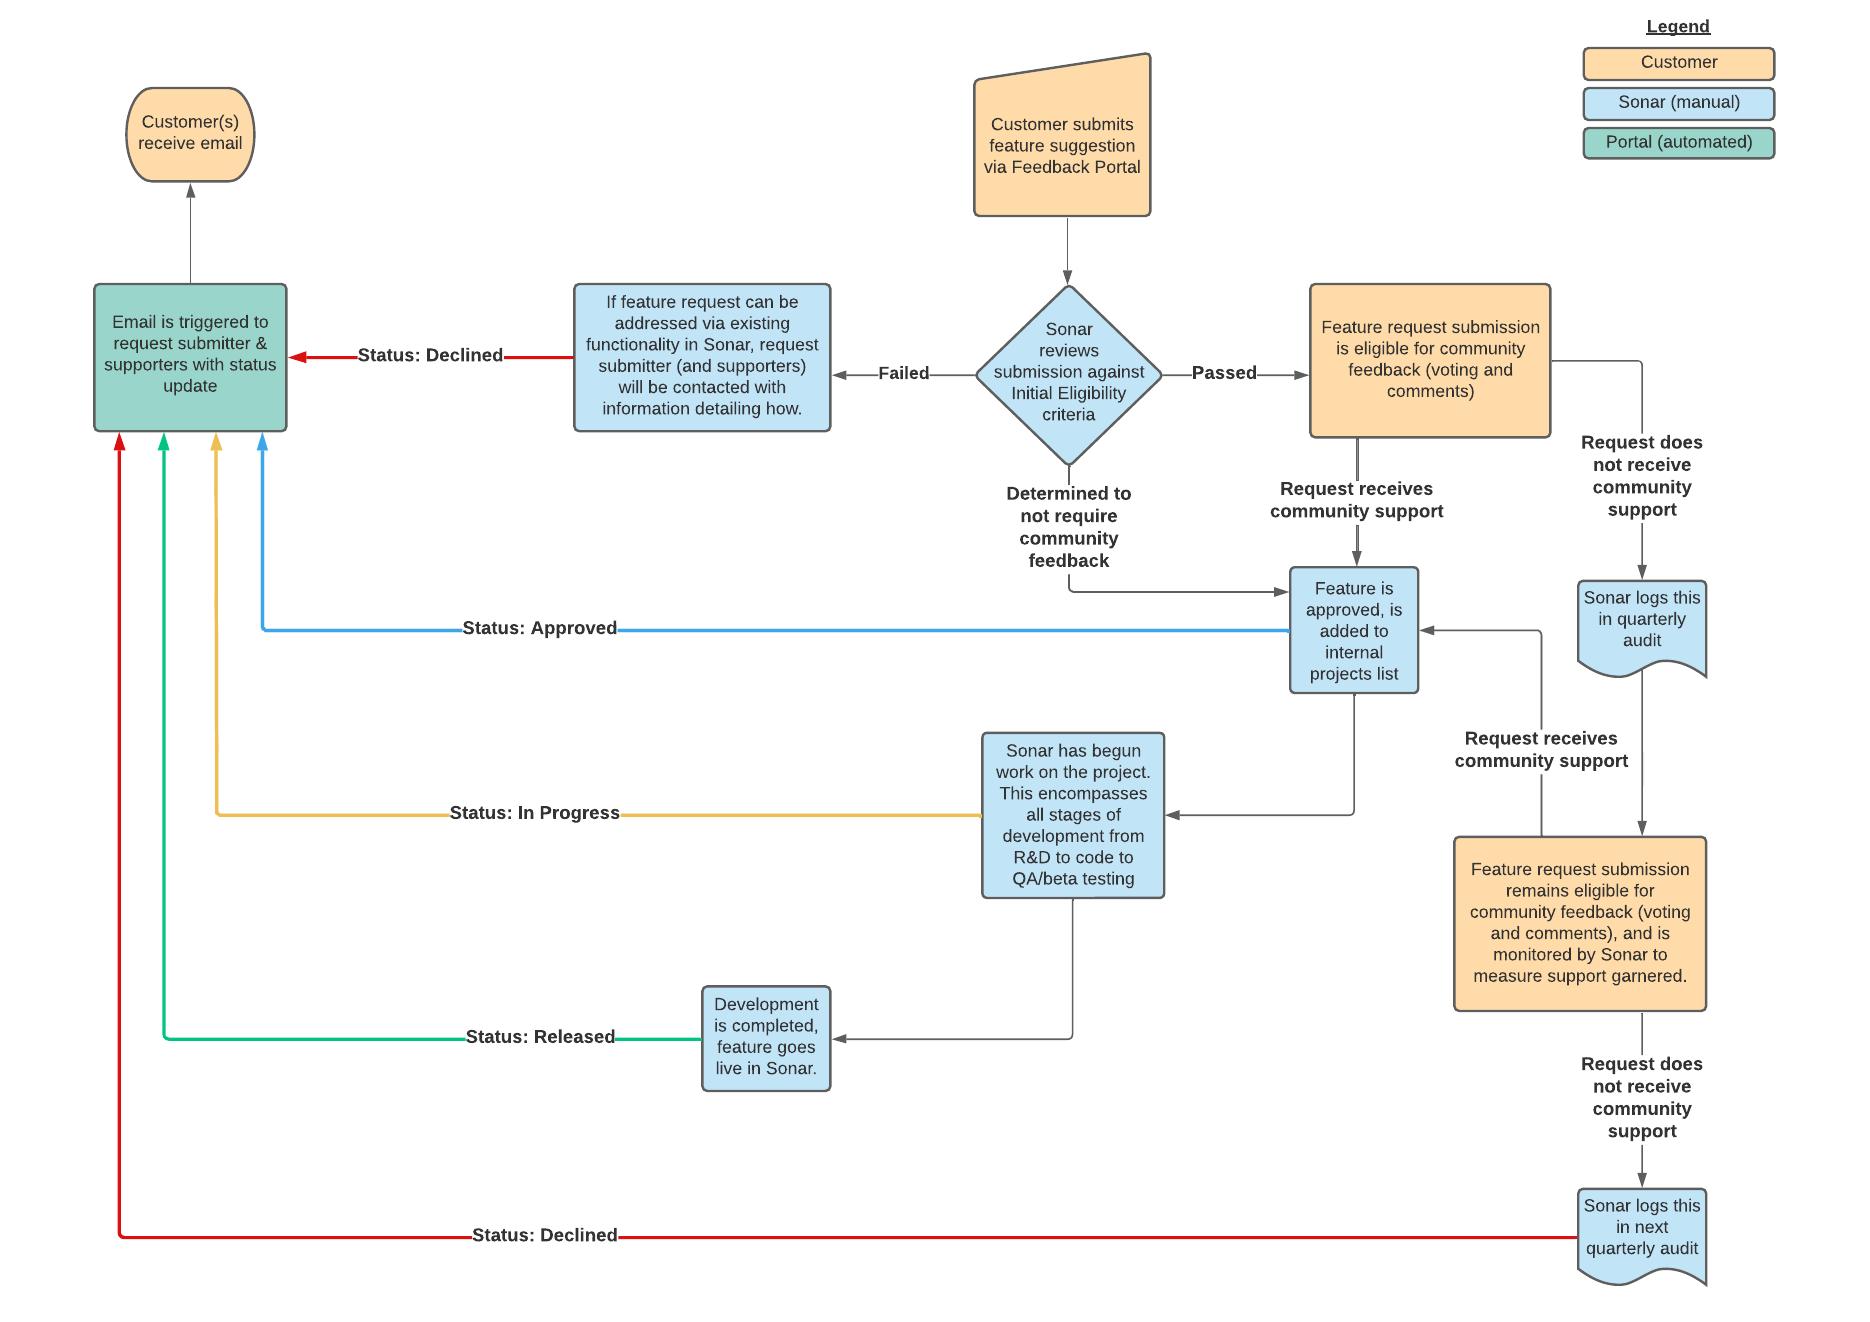 sonar feedback request approval flow chart